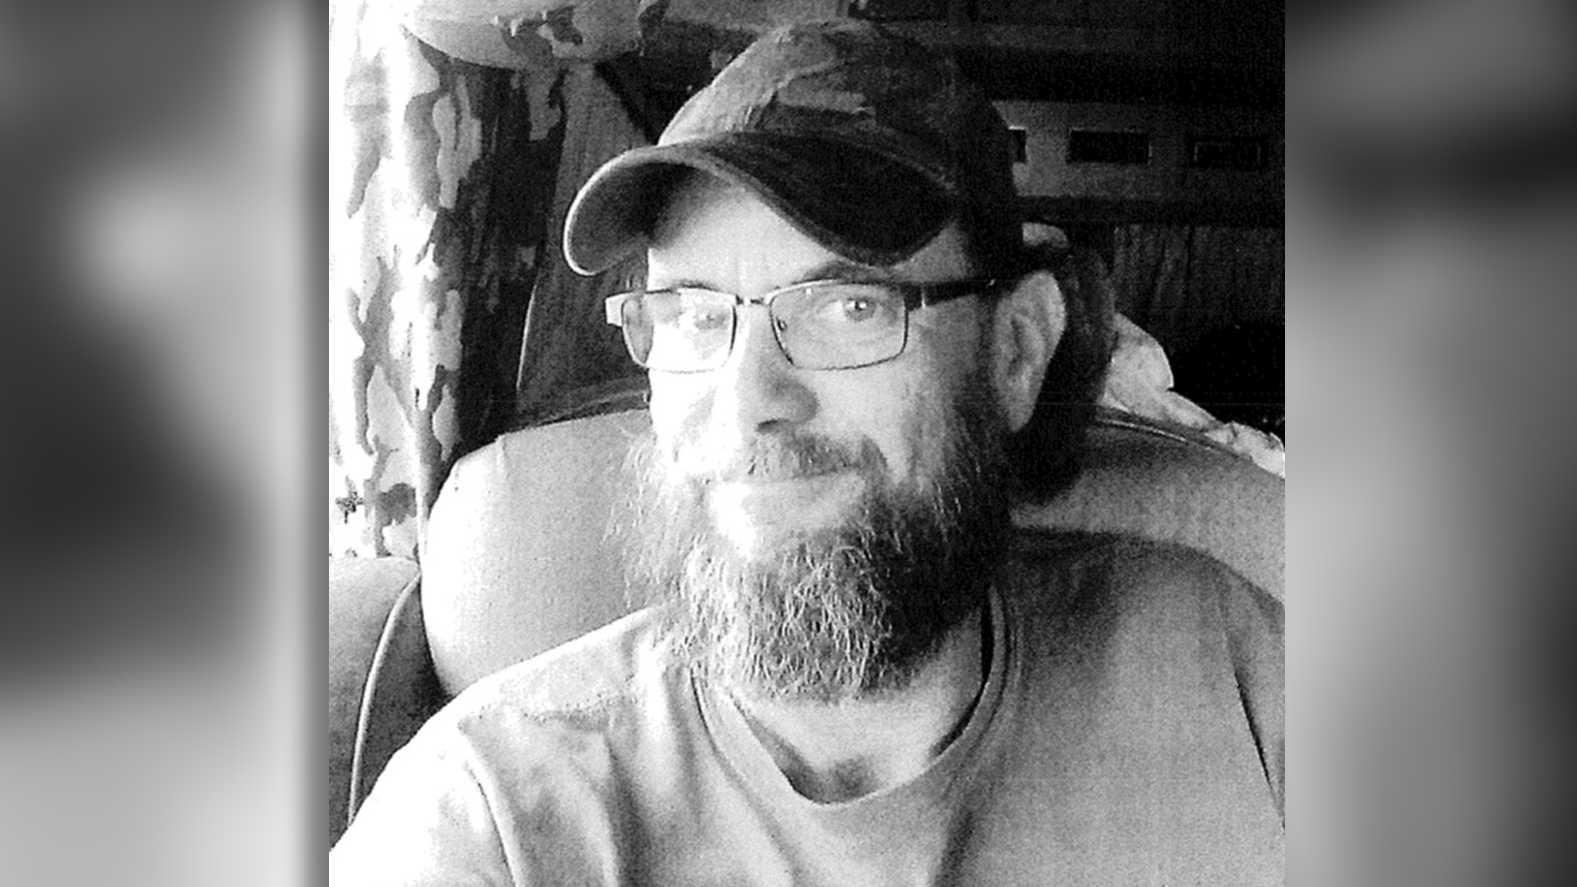 Stephen Houk, 46